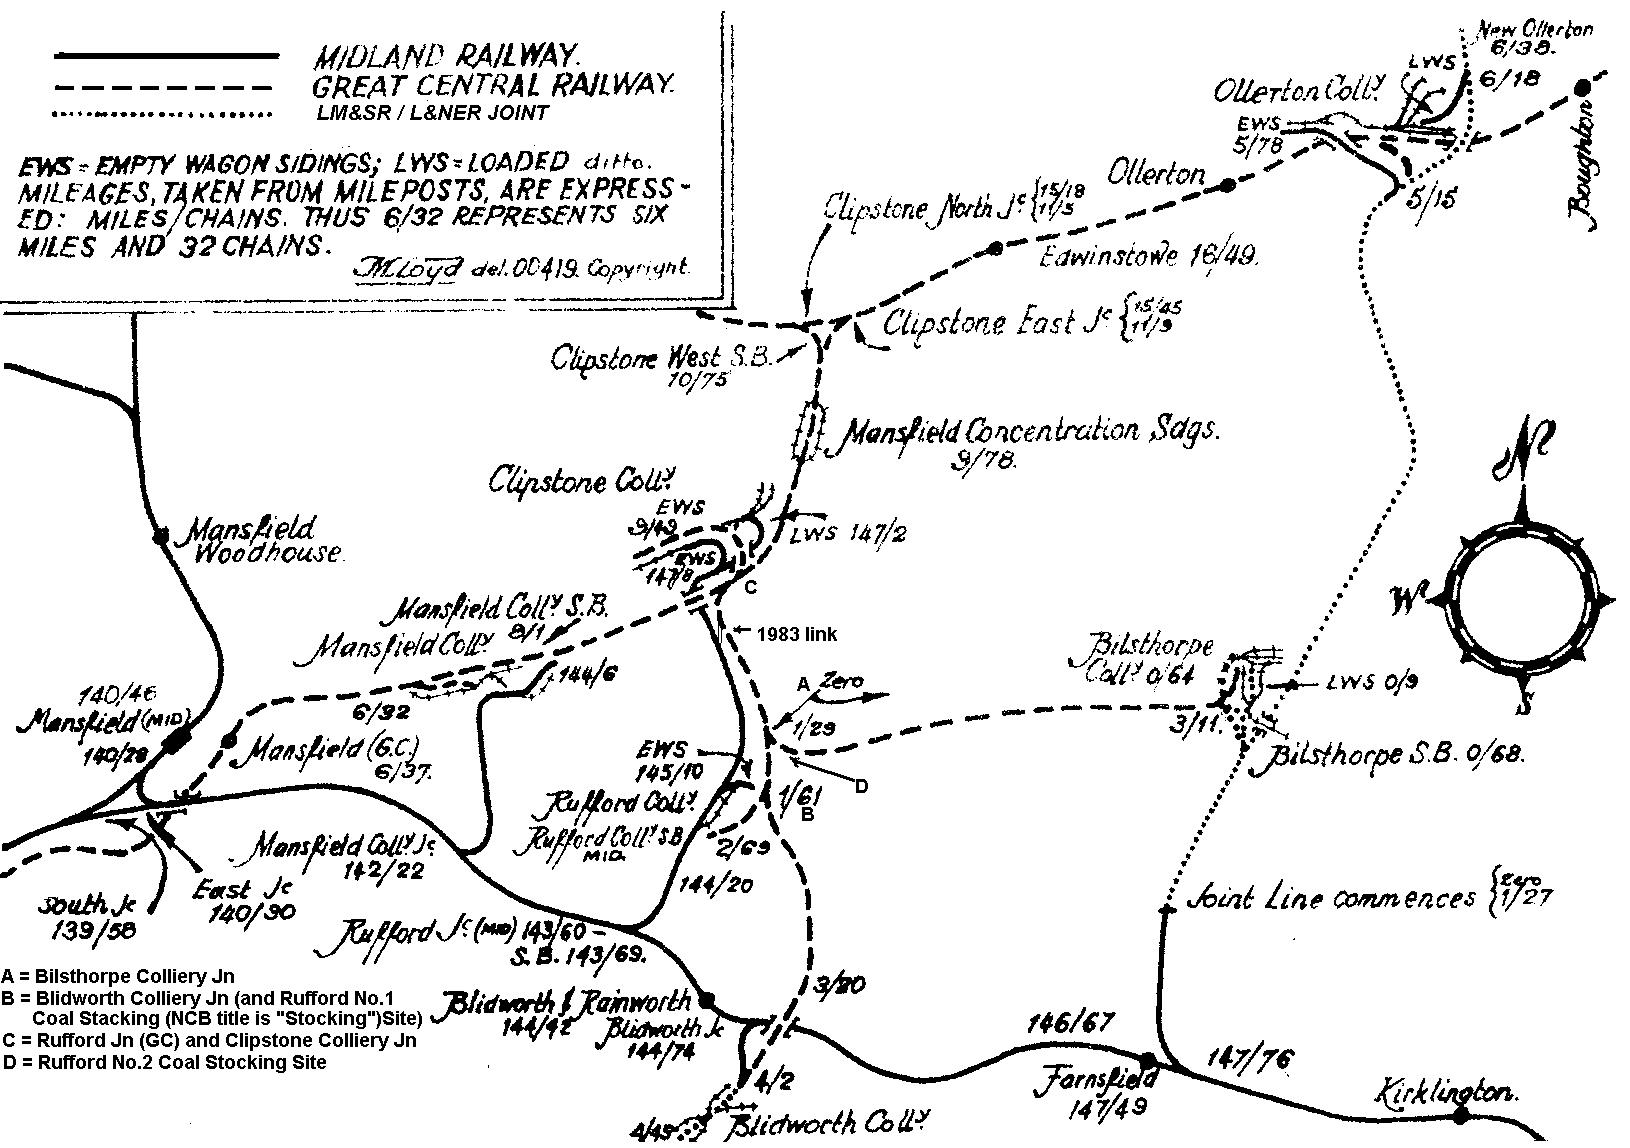 1630x1148 Rail Chronology East Of Mansfield